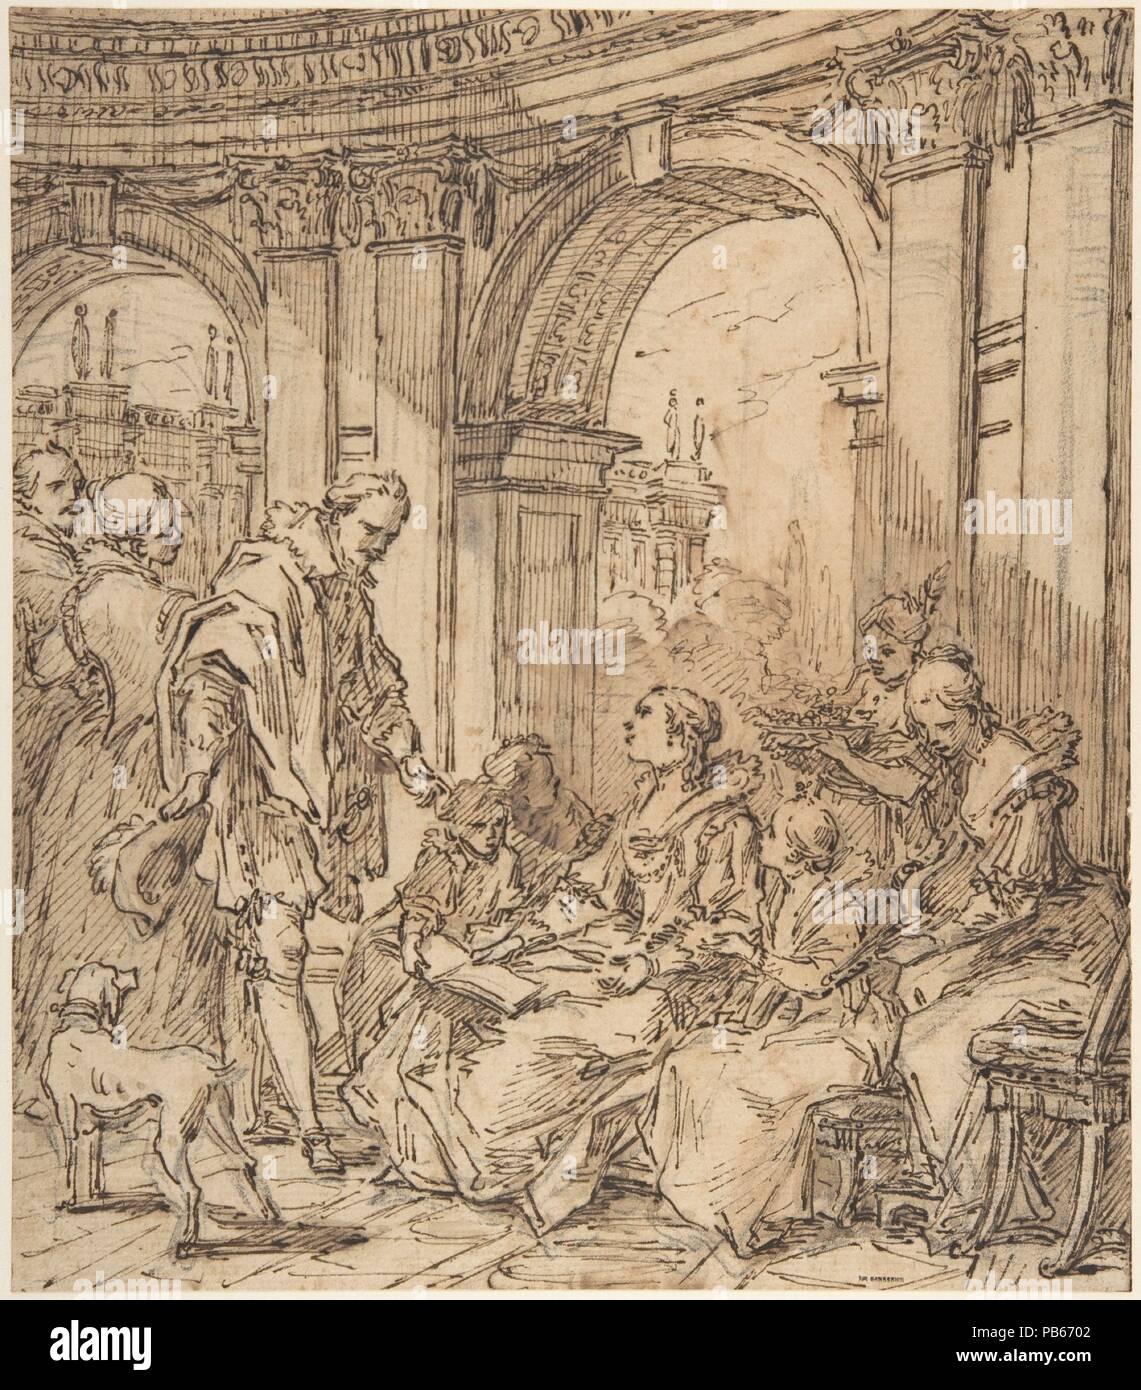 La Conversation espagnole. Artist: Carle (Charles André) Vanloo (French, Nice 1705-1765 Paris). Dimensions: 10 1/16 x 8 3/4 in.  (25.5 x 22.3 cm). Date: 1754. Museum: Metropolitan Museum of Art, New York, USA. - Stock Image